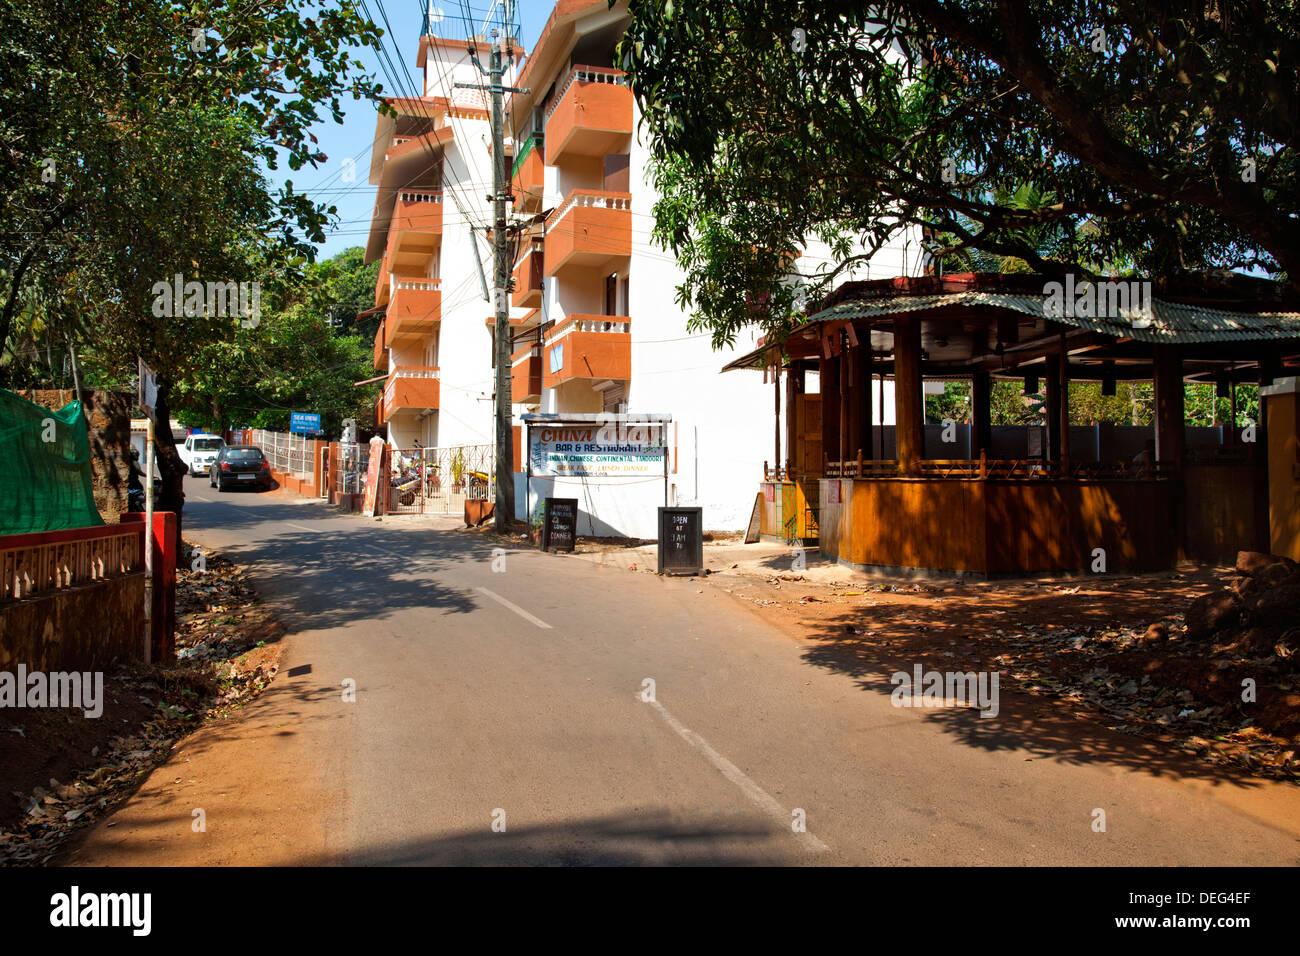 Restaurant at the roadside, China Town Bar and Restaurant, Vagator Beach Road, Vagator, Bardez, North Goa, Goa, Stock Photo